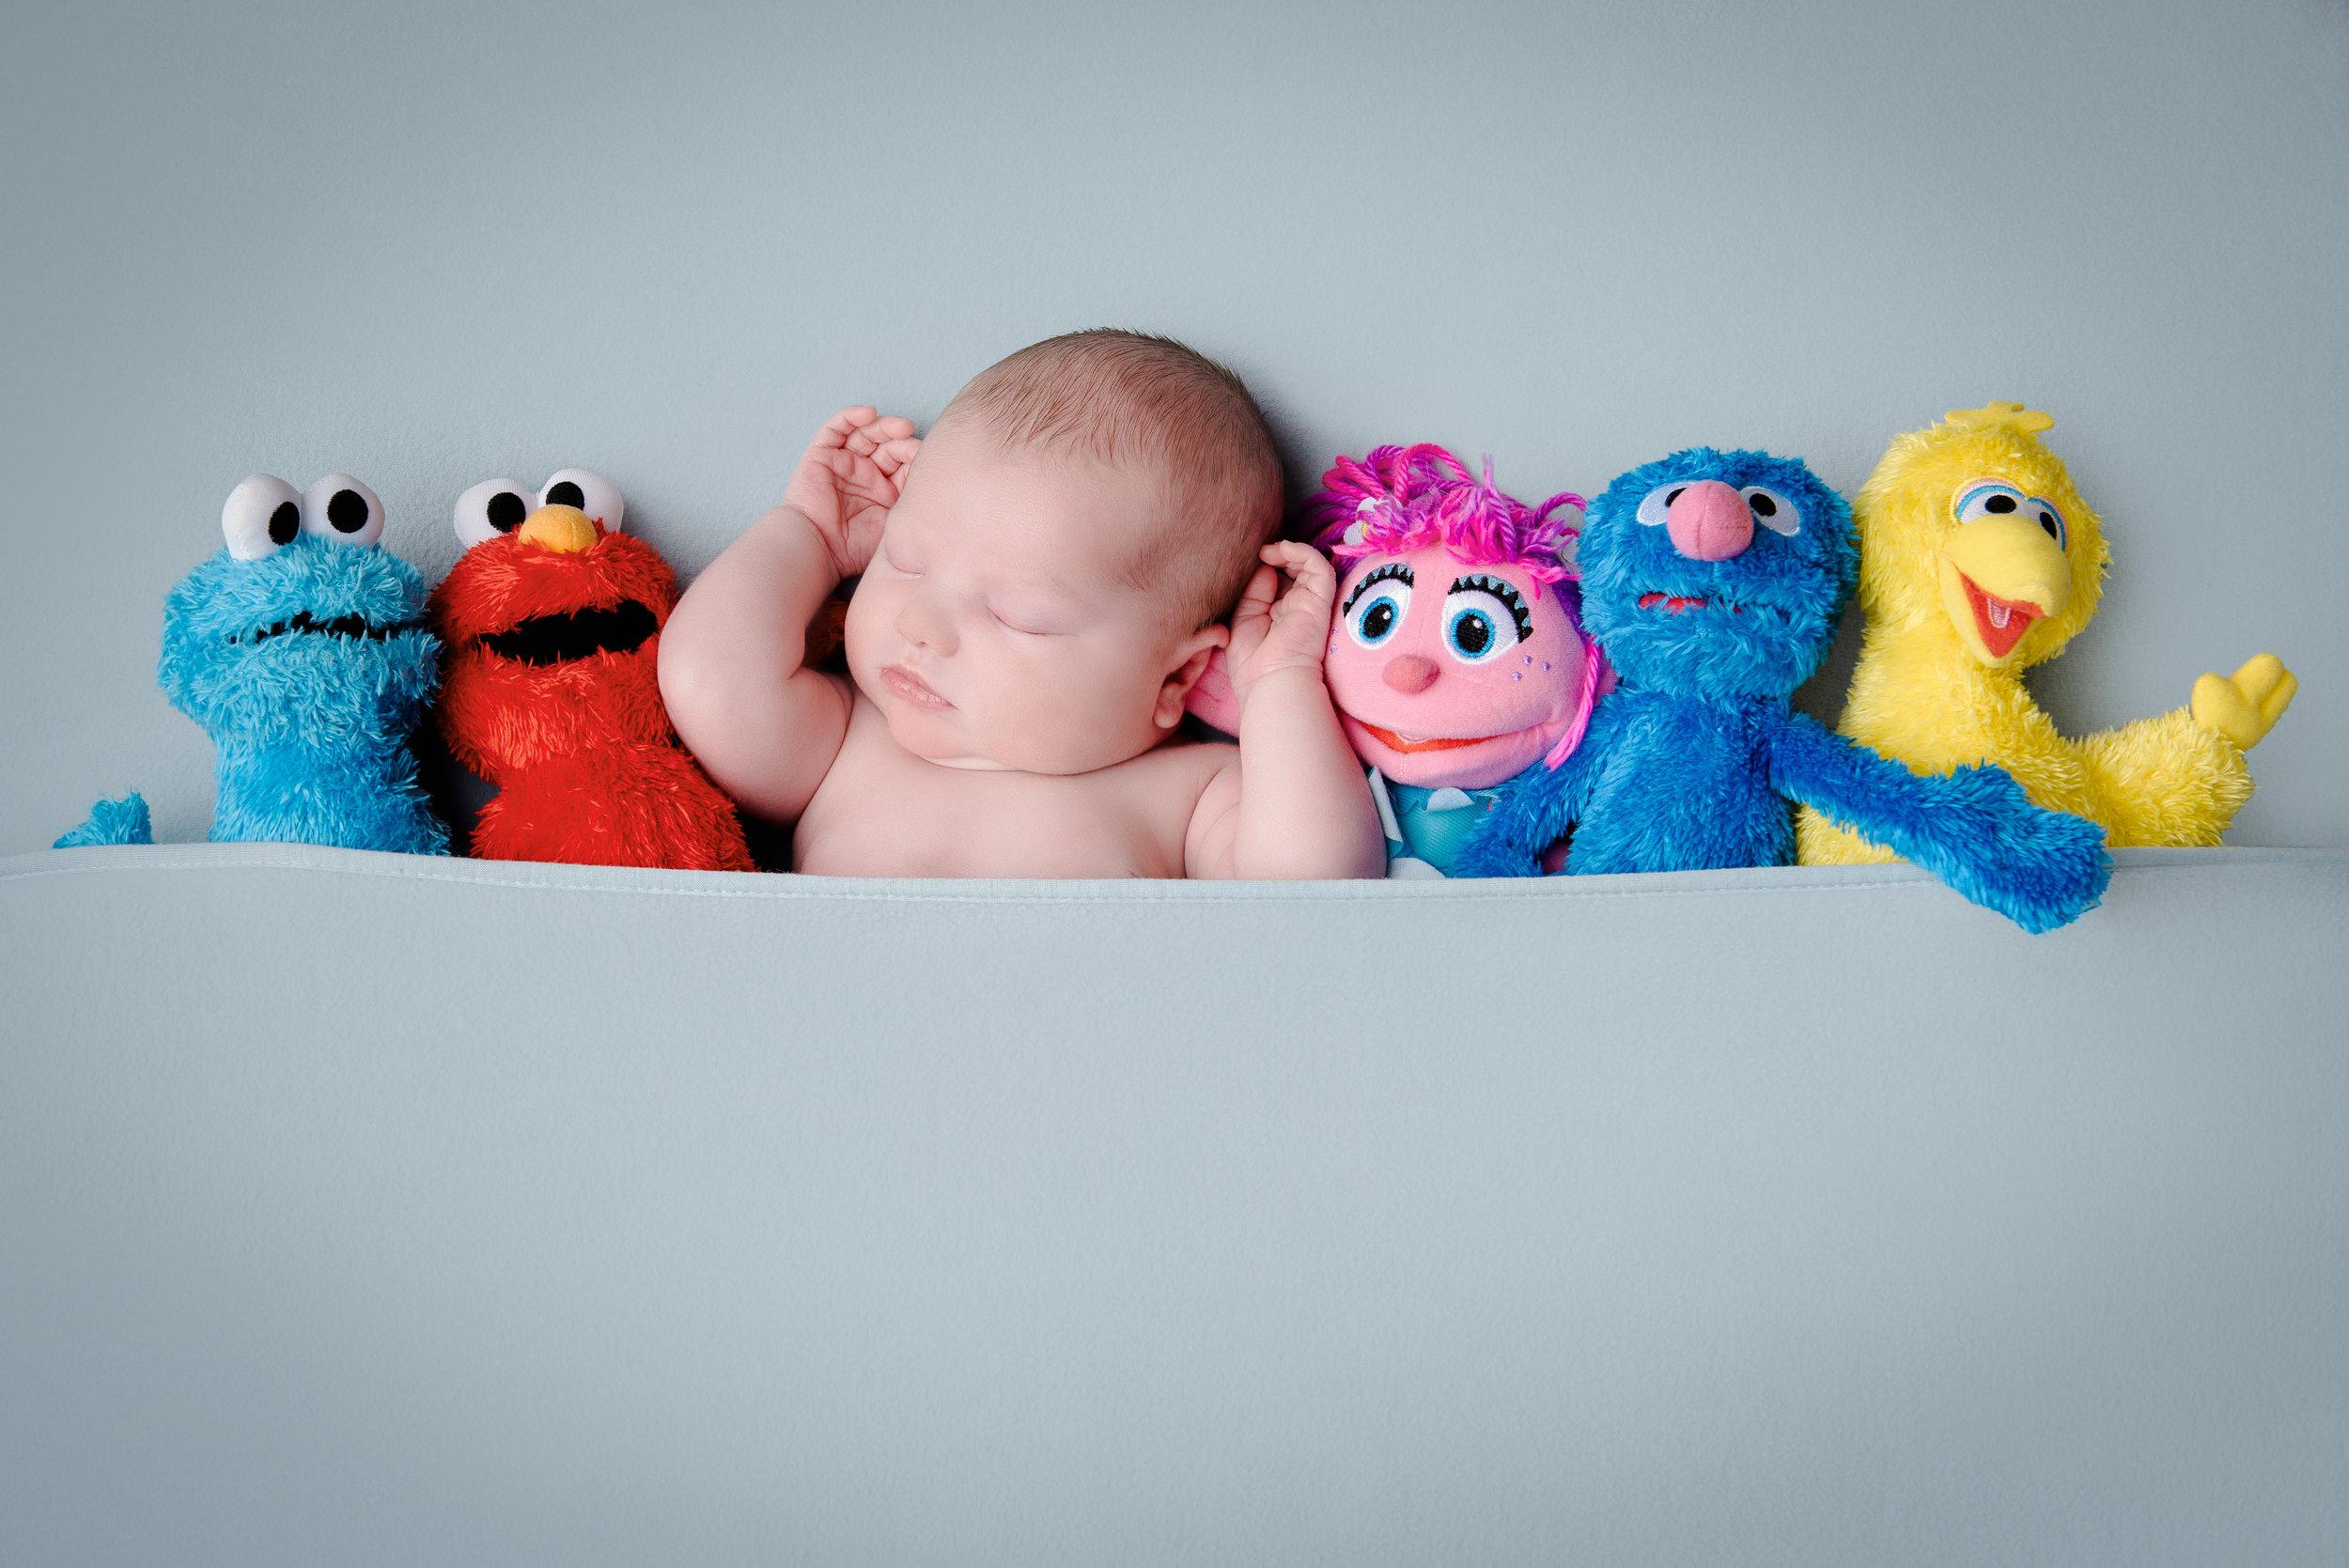 harmony_newborn-5.jpg